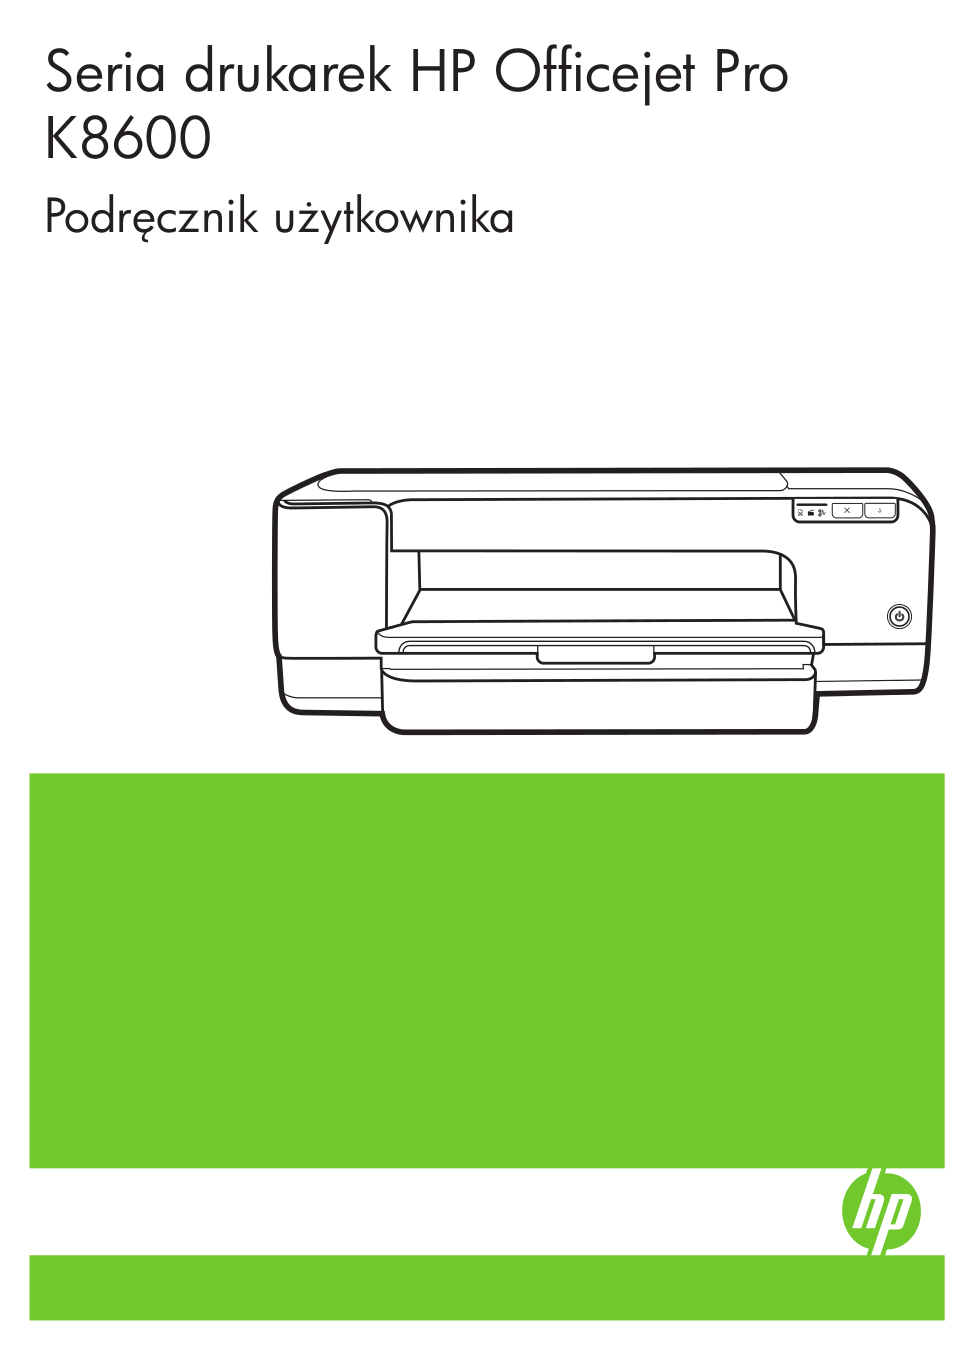 pdf for HP Printer Officejet Pro K8600 manual